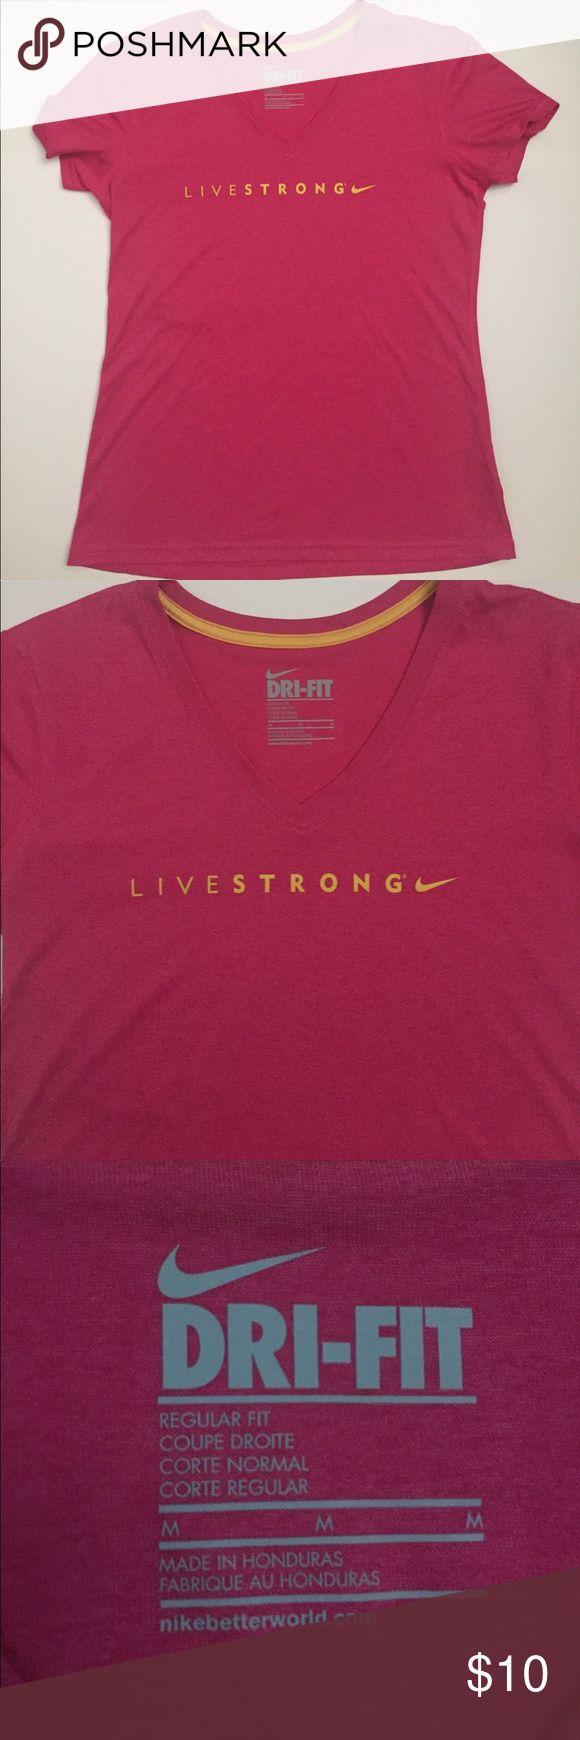 Nike Dri-Fit Tee Pink Nike Livestrong dri fit tee. Size medium. Never worn. Nike Tops Tees - Short Sleeve